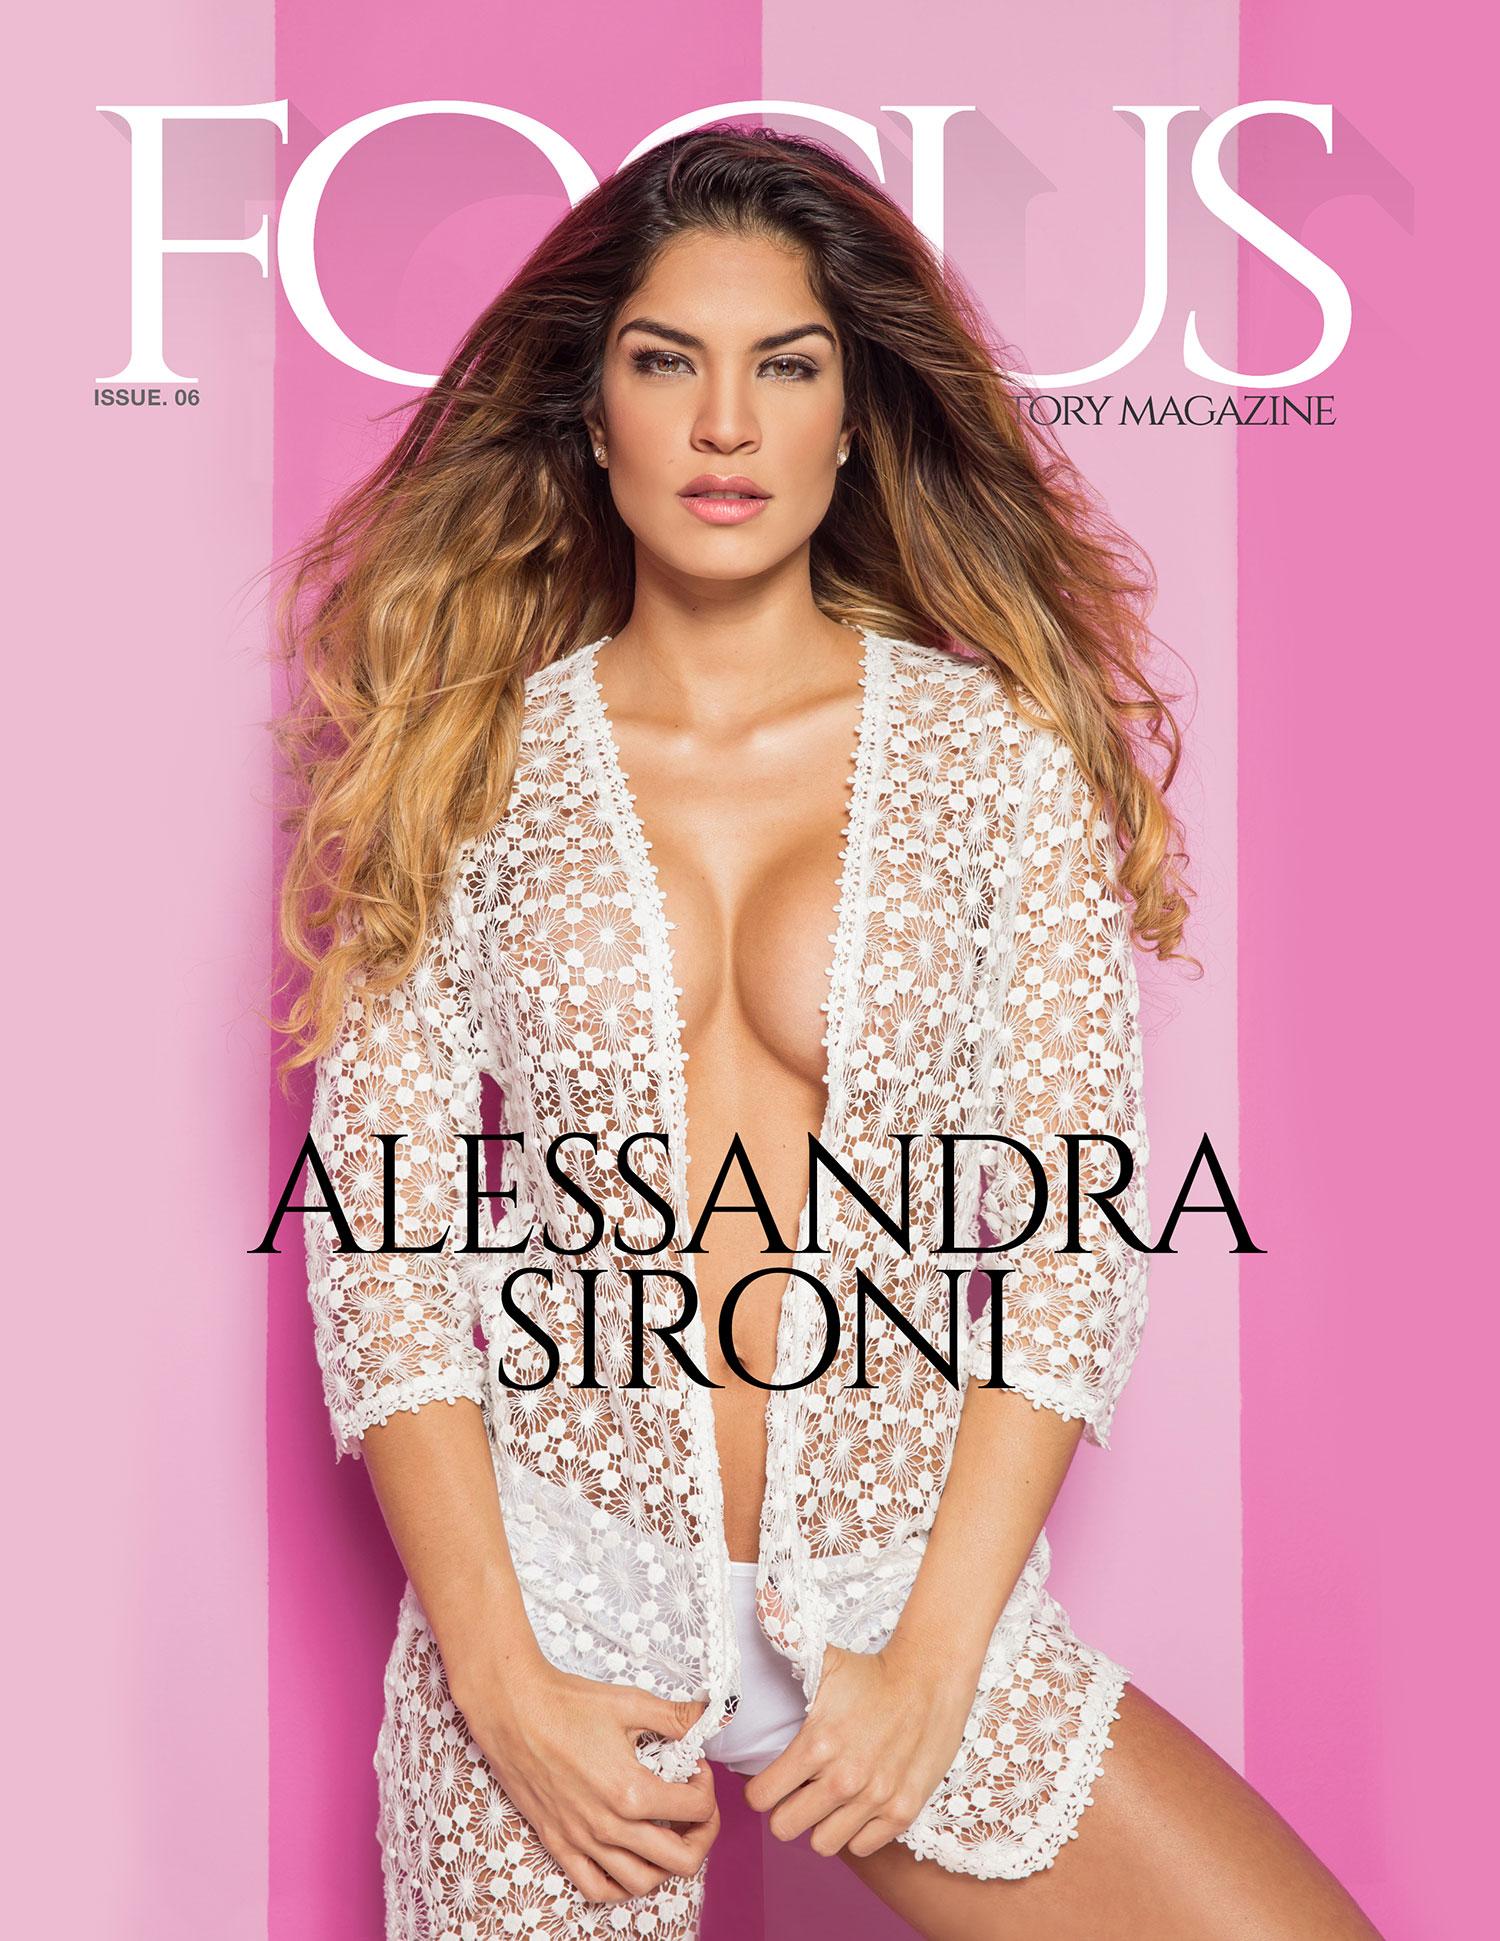 FFM-February-Cover-Alessandra Sironi Small.jpg